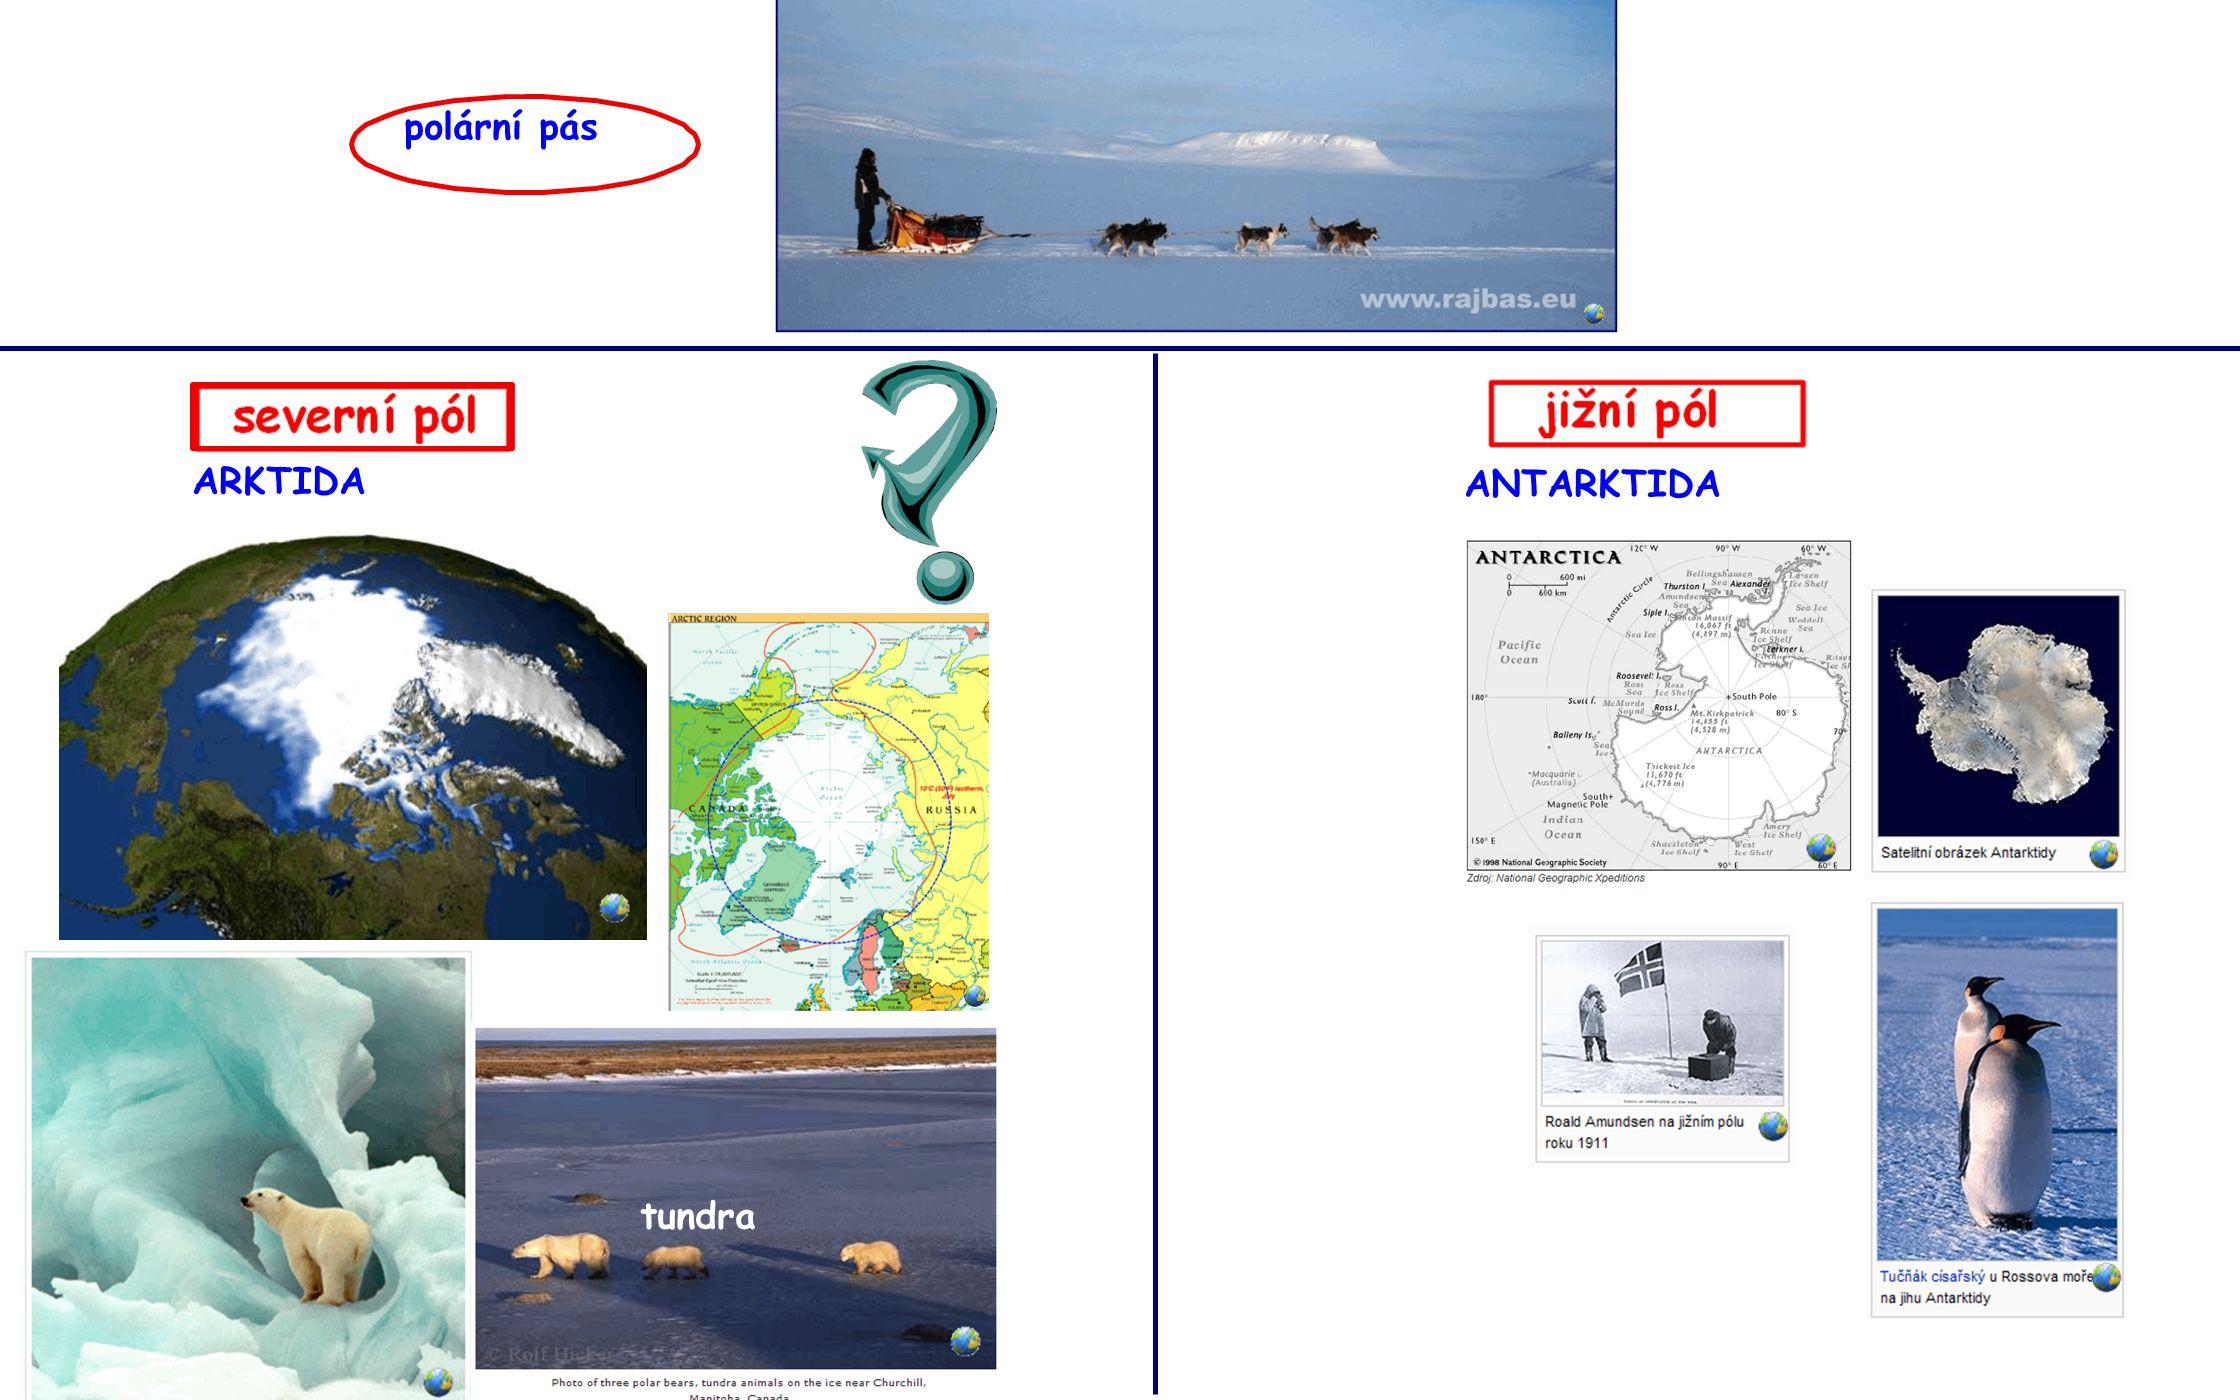 polární pás ARKTIDA ANTARKTIDA tundra